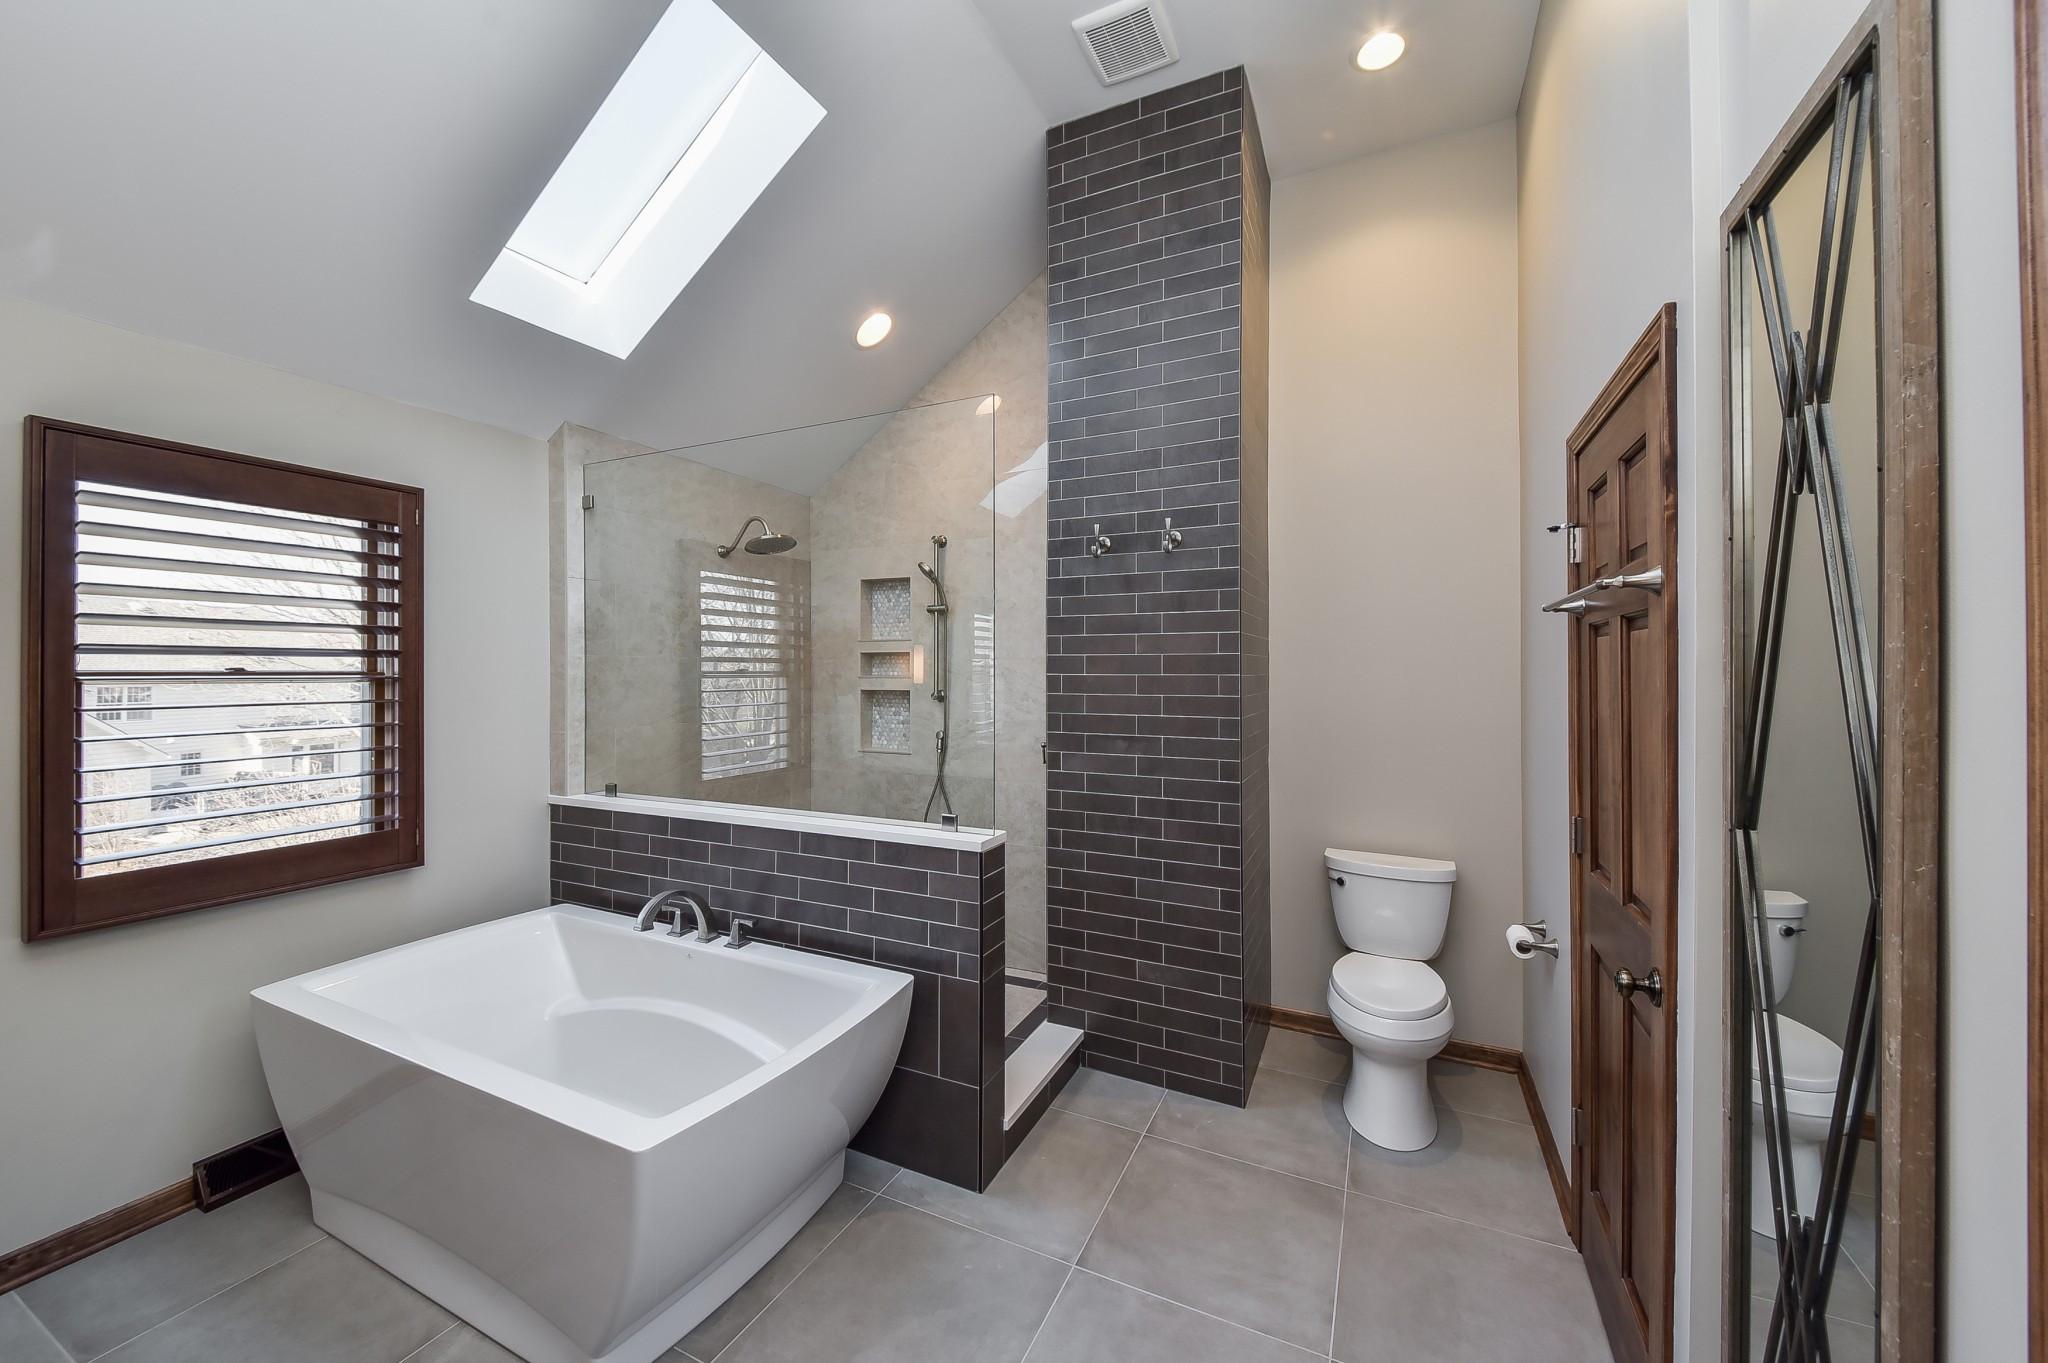 Bathroom Remodel Ideas 2020  14 Bathroom Design Trends For 2020